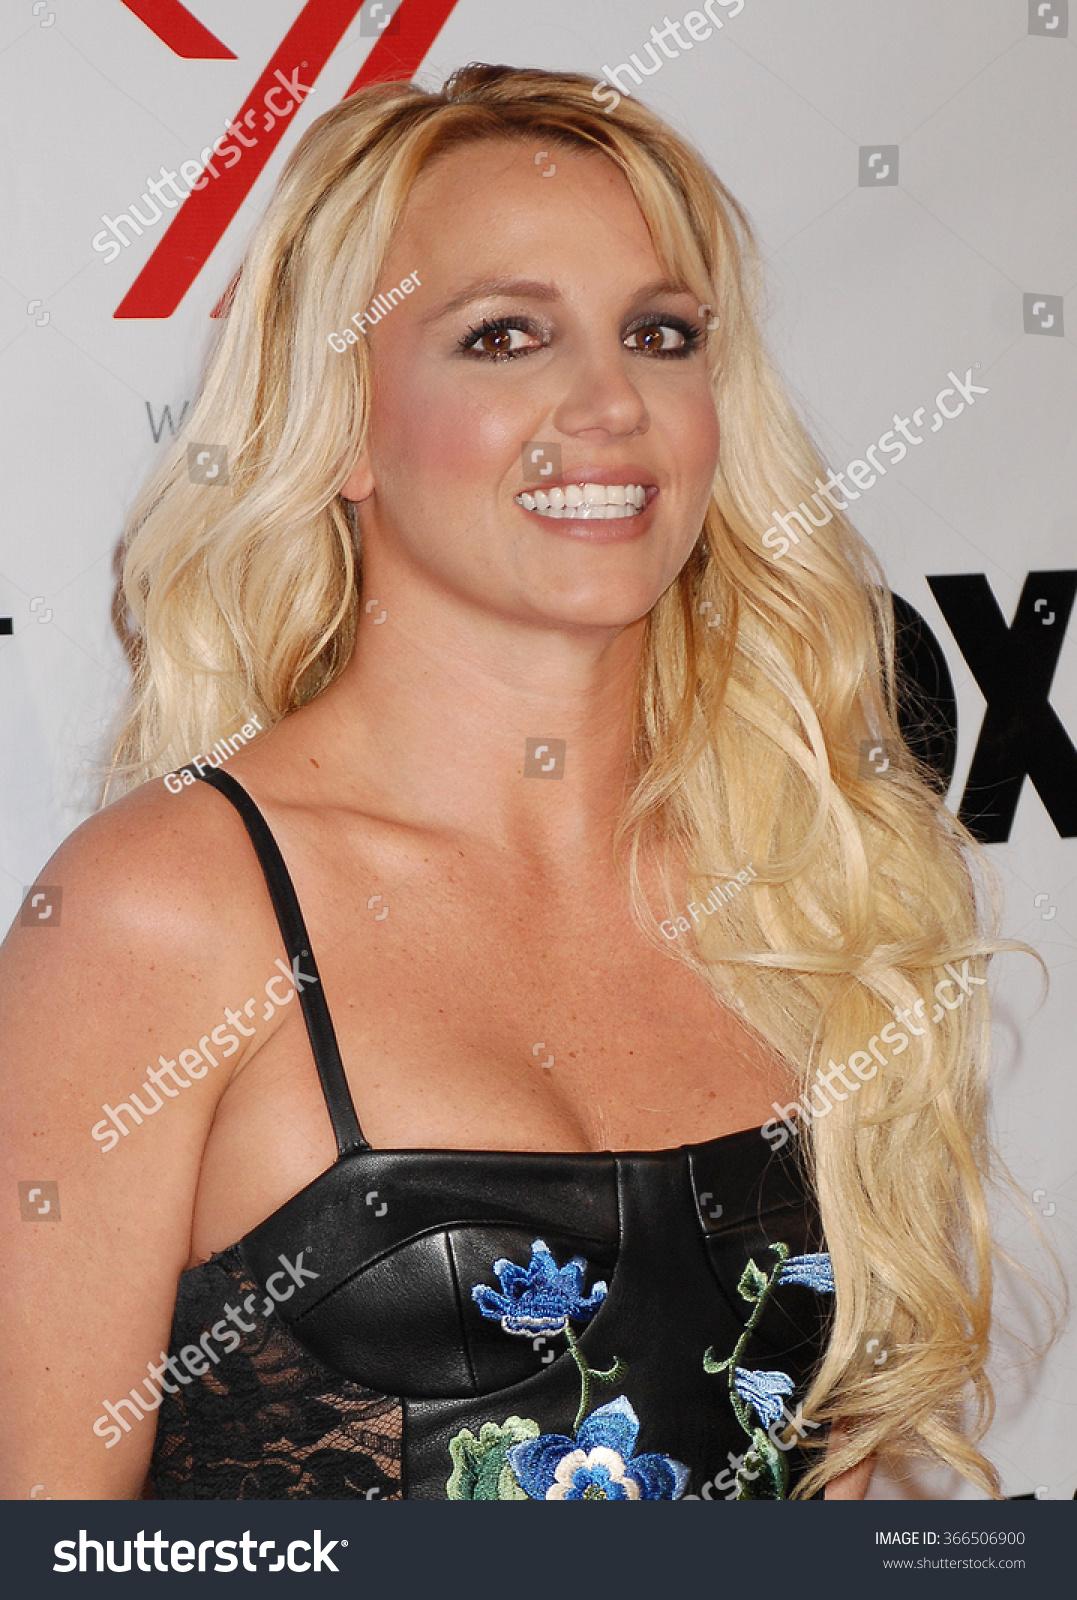 6. Britney Spears